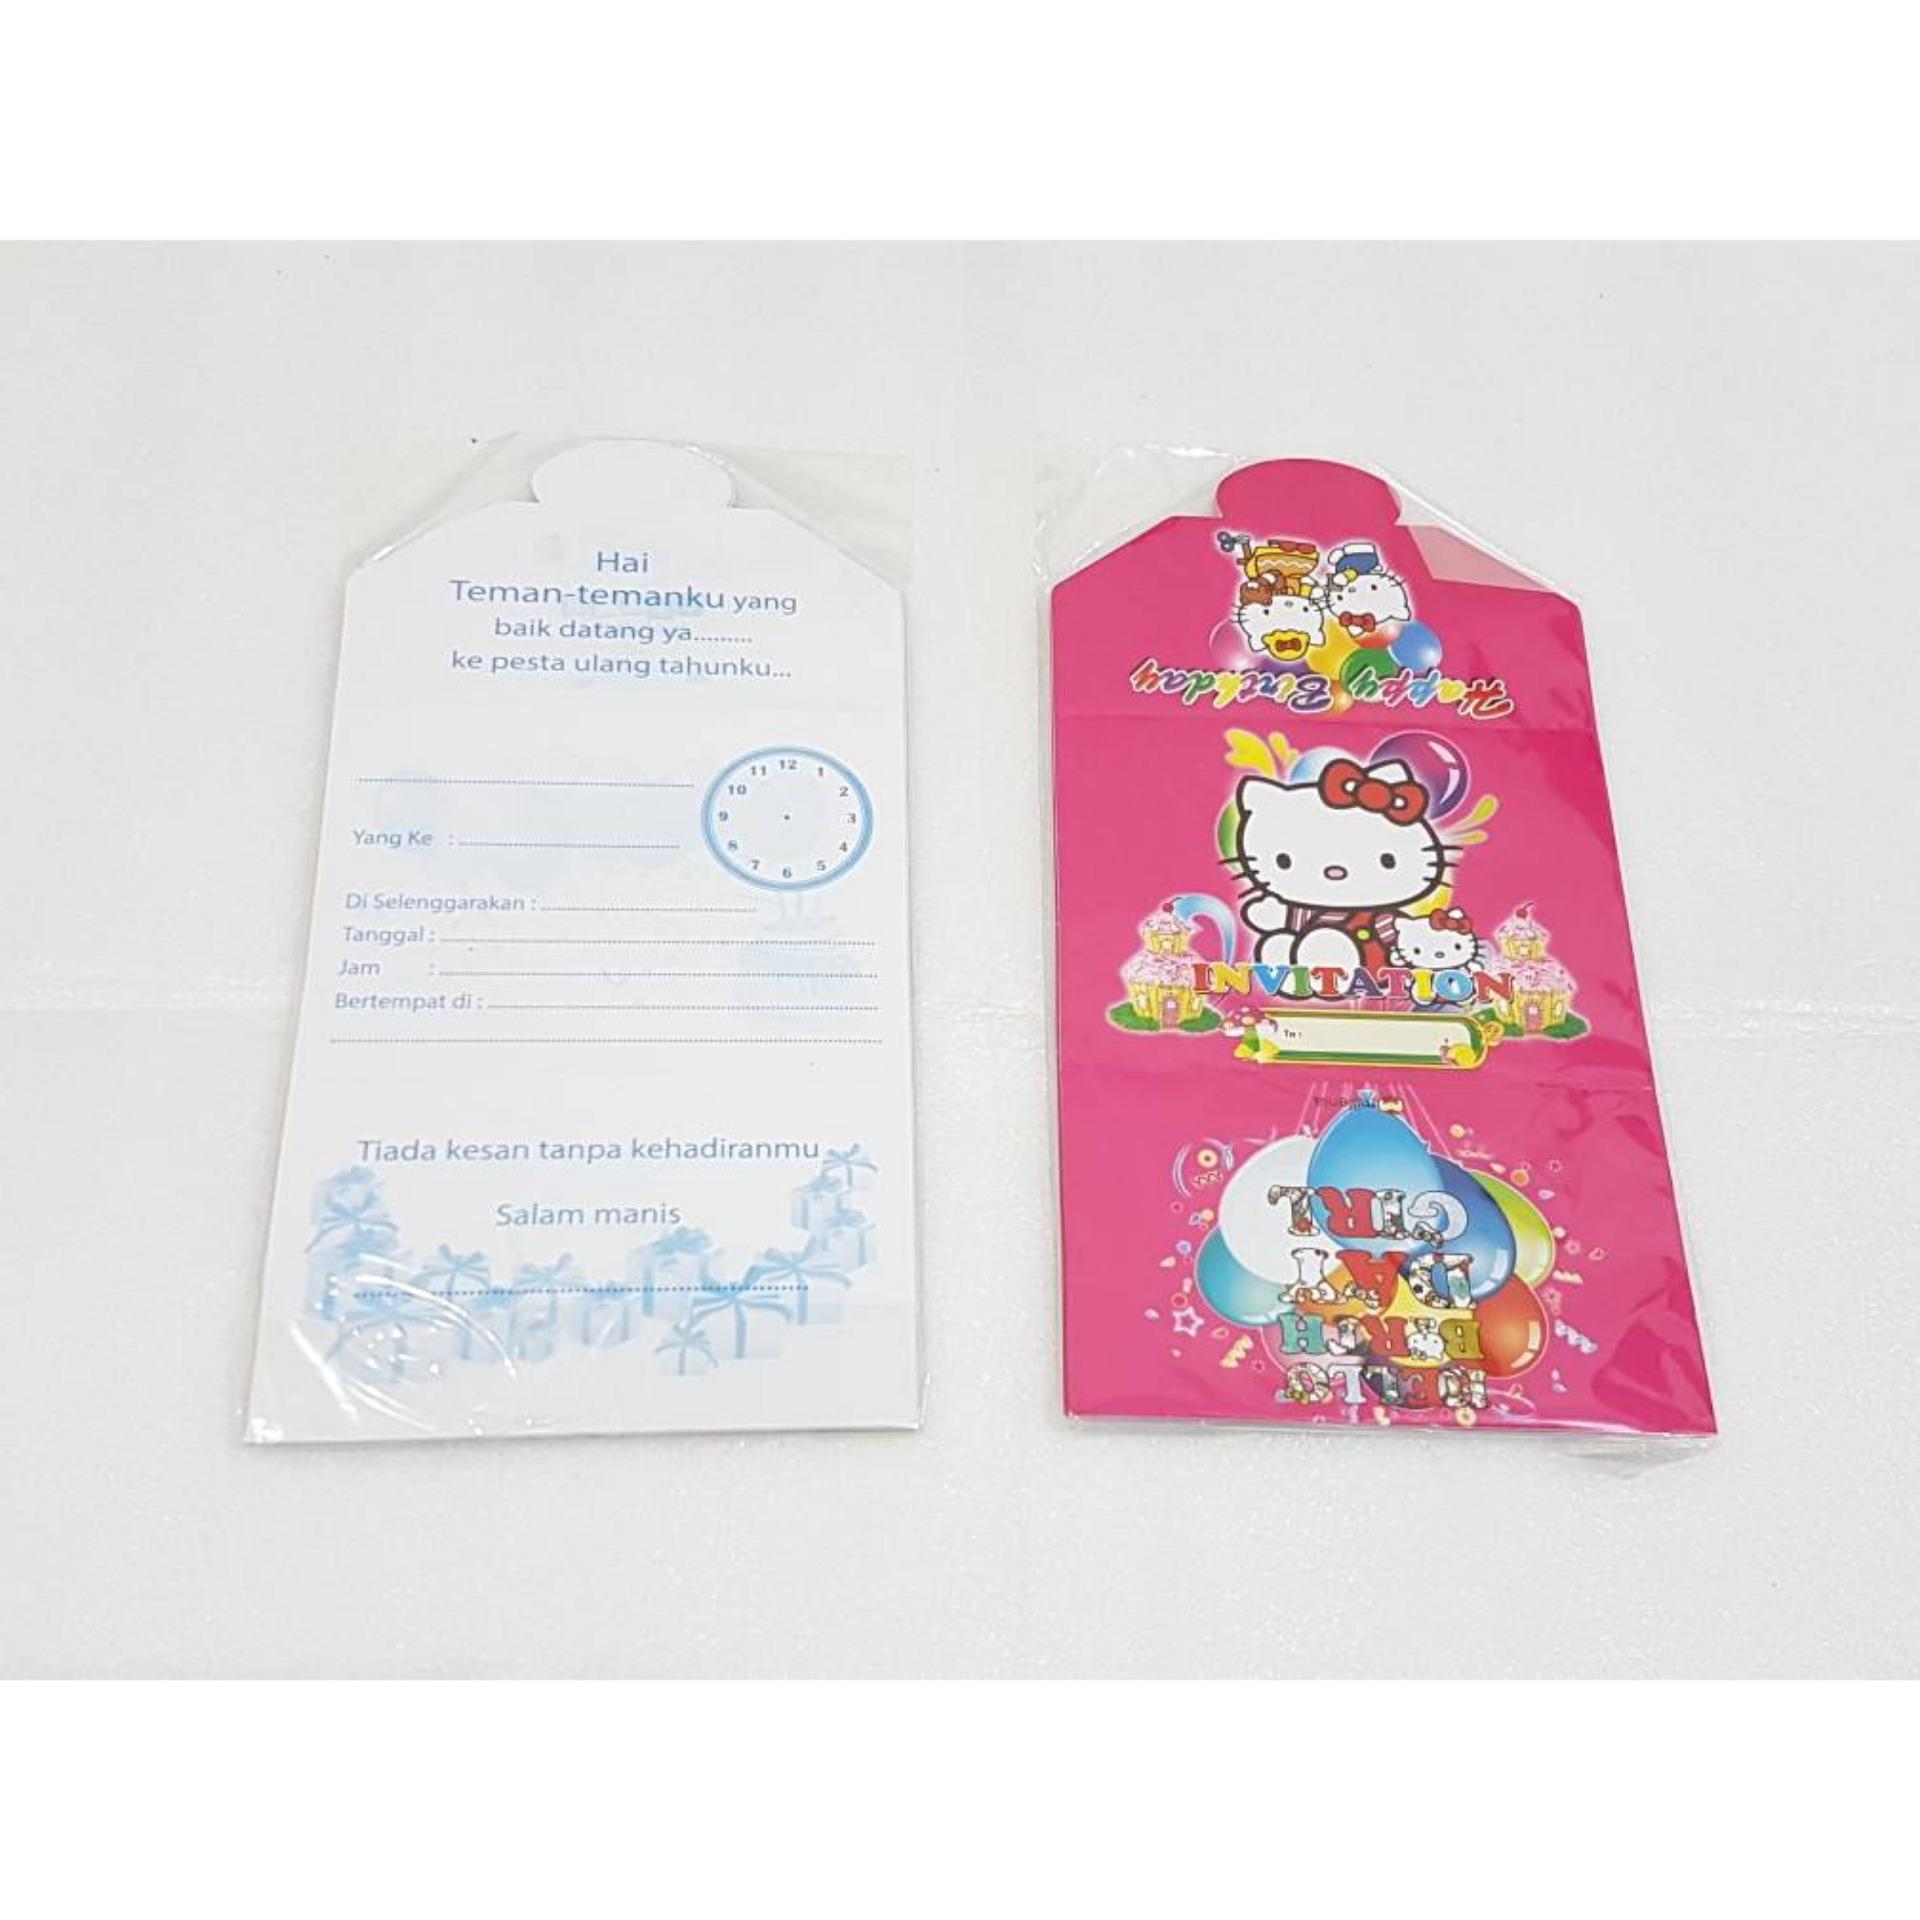 Kartu Undangan Lipat 3 Motif Hello Kitty Part 2 Daftar Harga Kode Blangko 88187 1